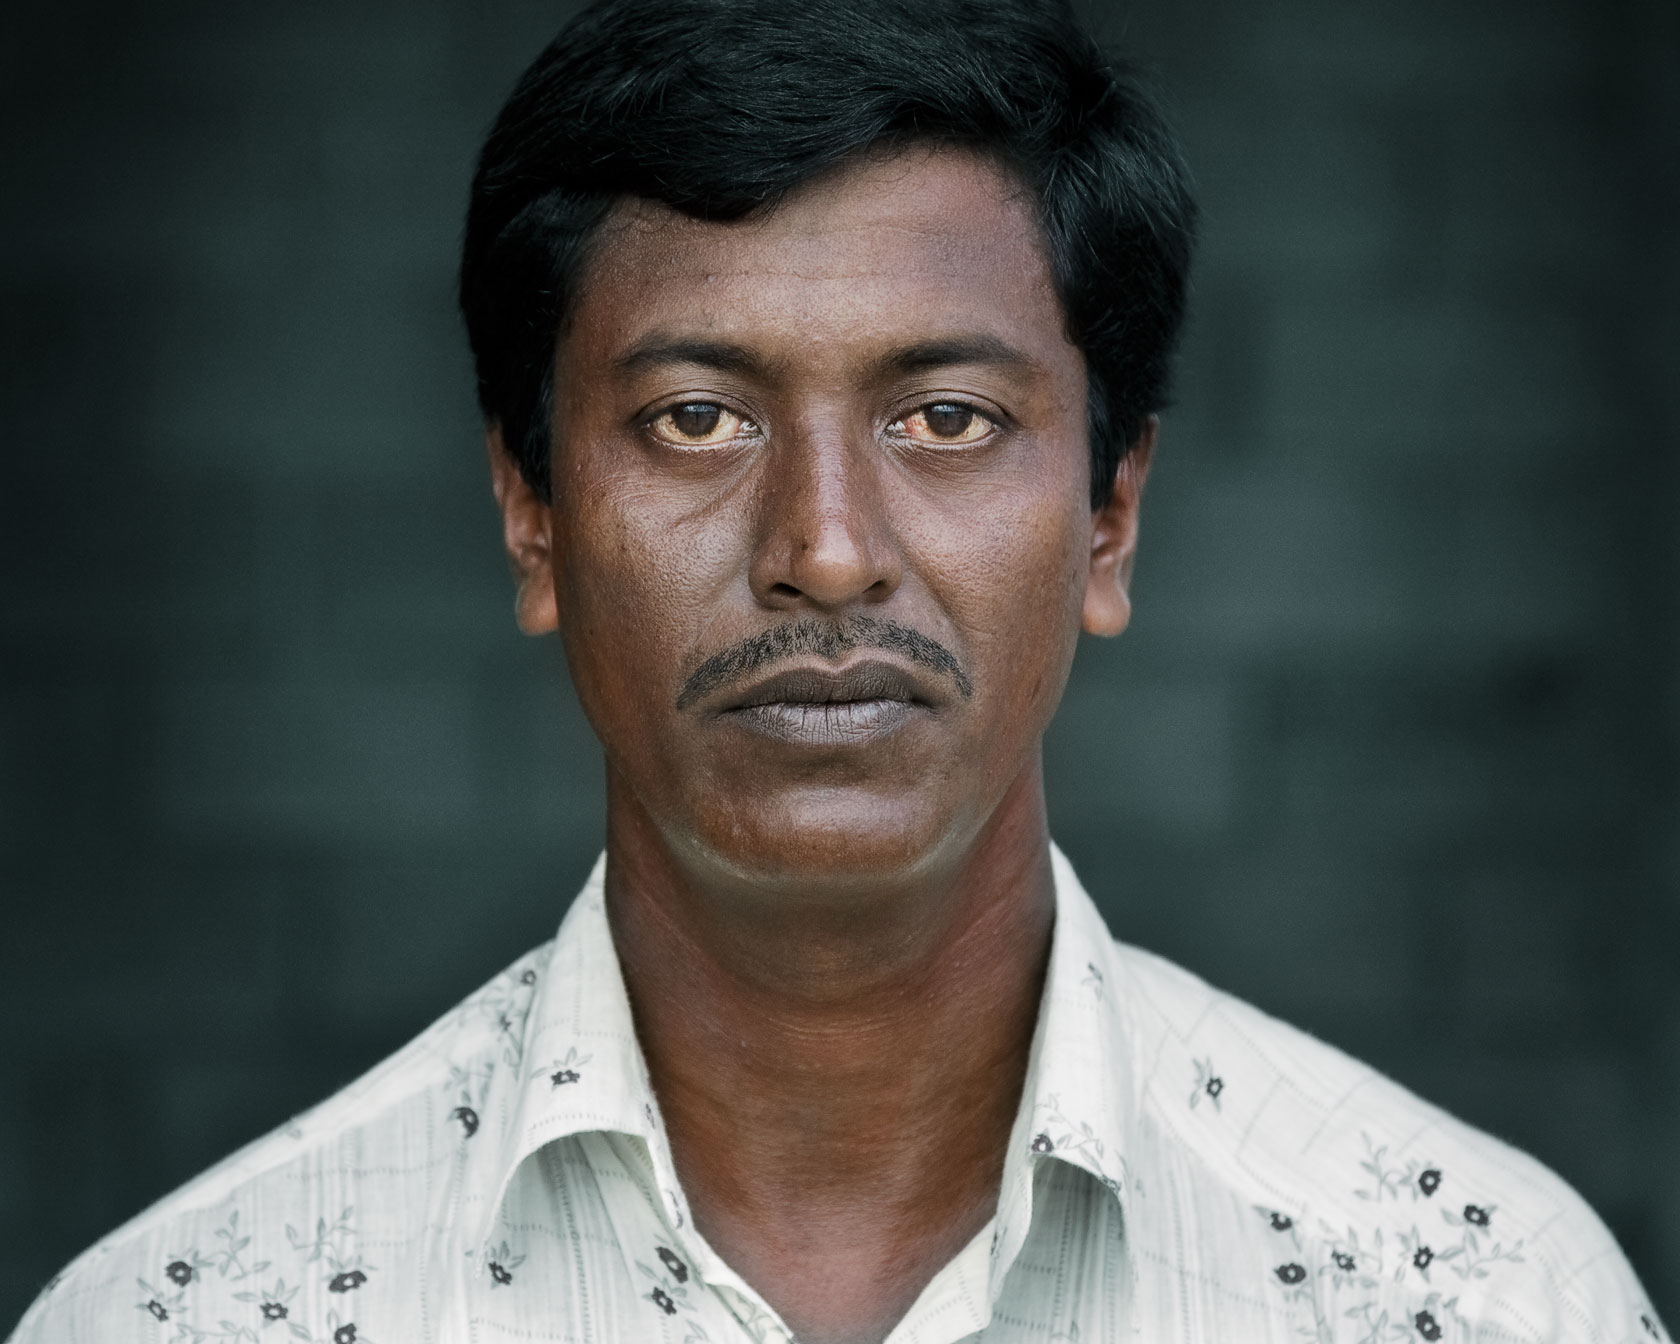 BangaladeshiWorkers_web.jpg